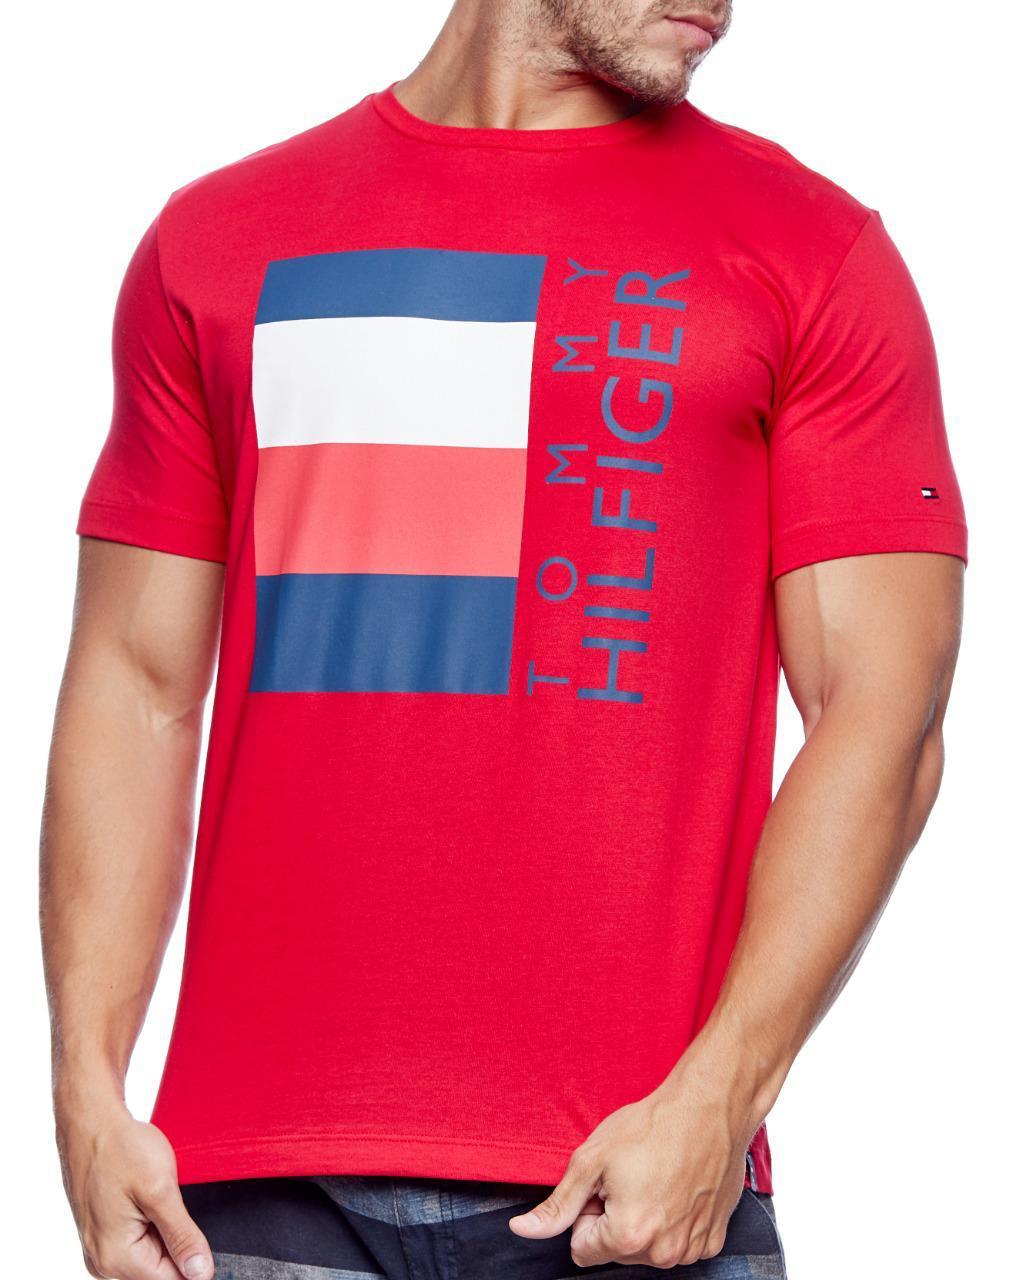 Camiseta Tommy Hilfiger Masculina Flag Lettering TH Vermelho